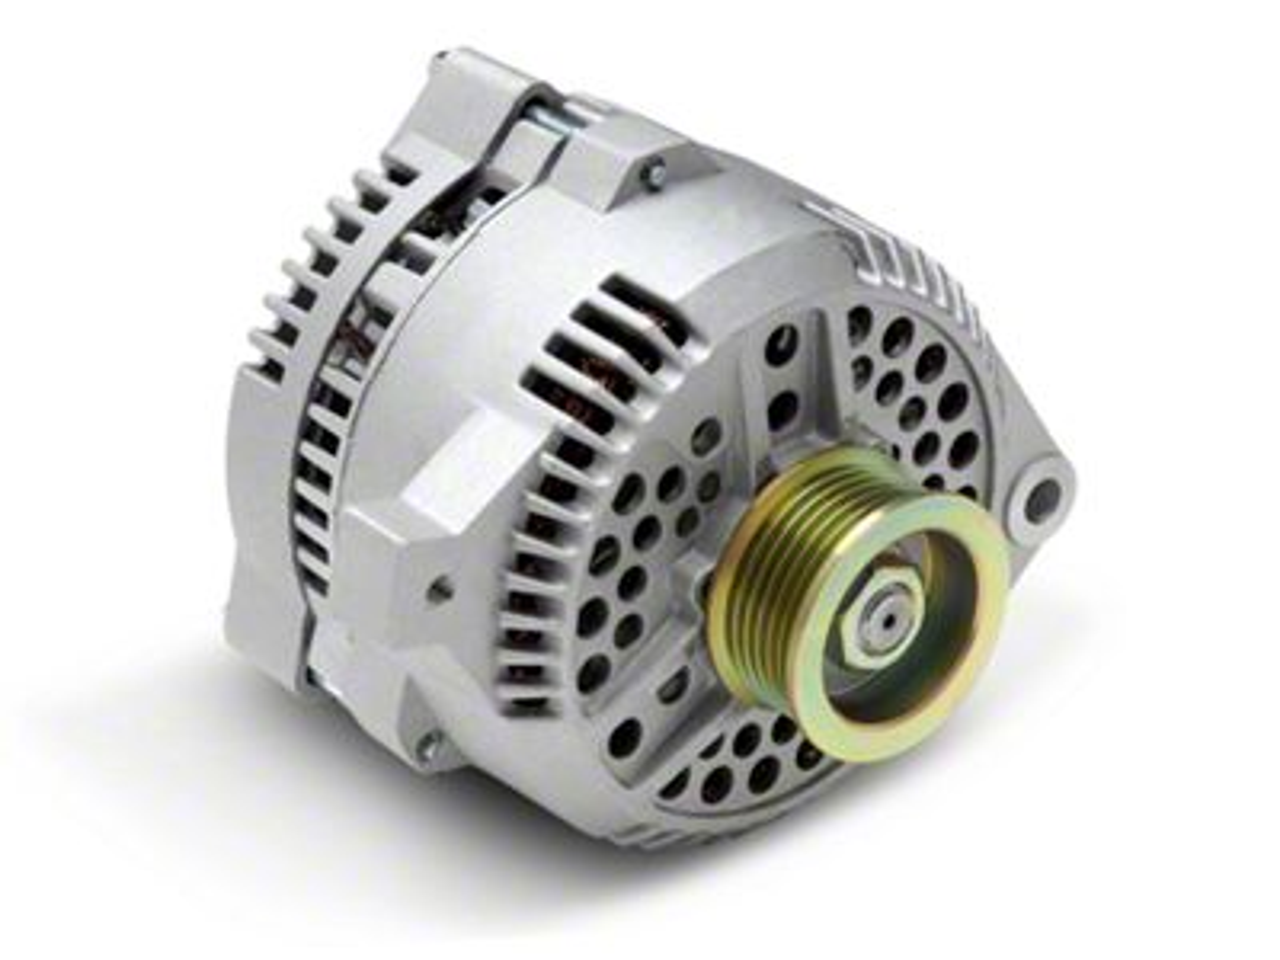 PA Performance High Output Alternator - 200 Amp (87-93 5.0L)